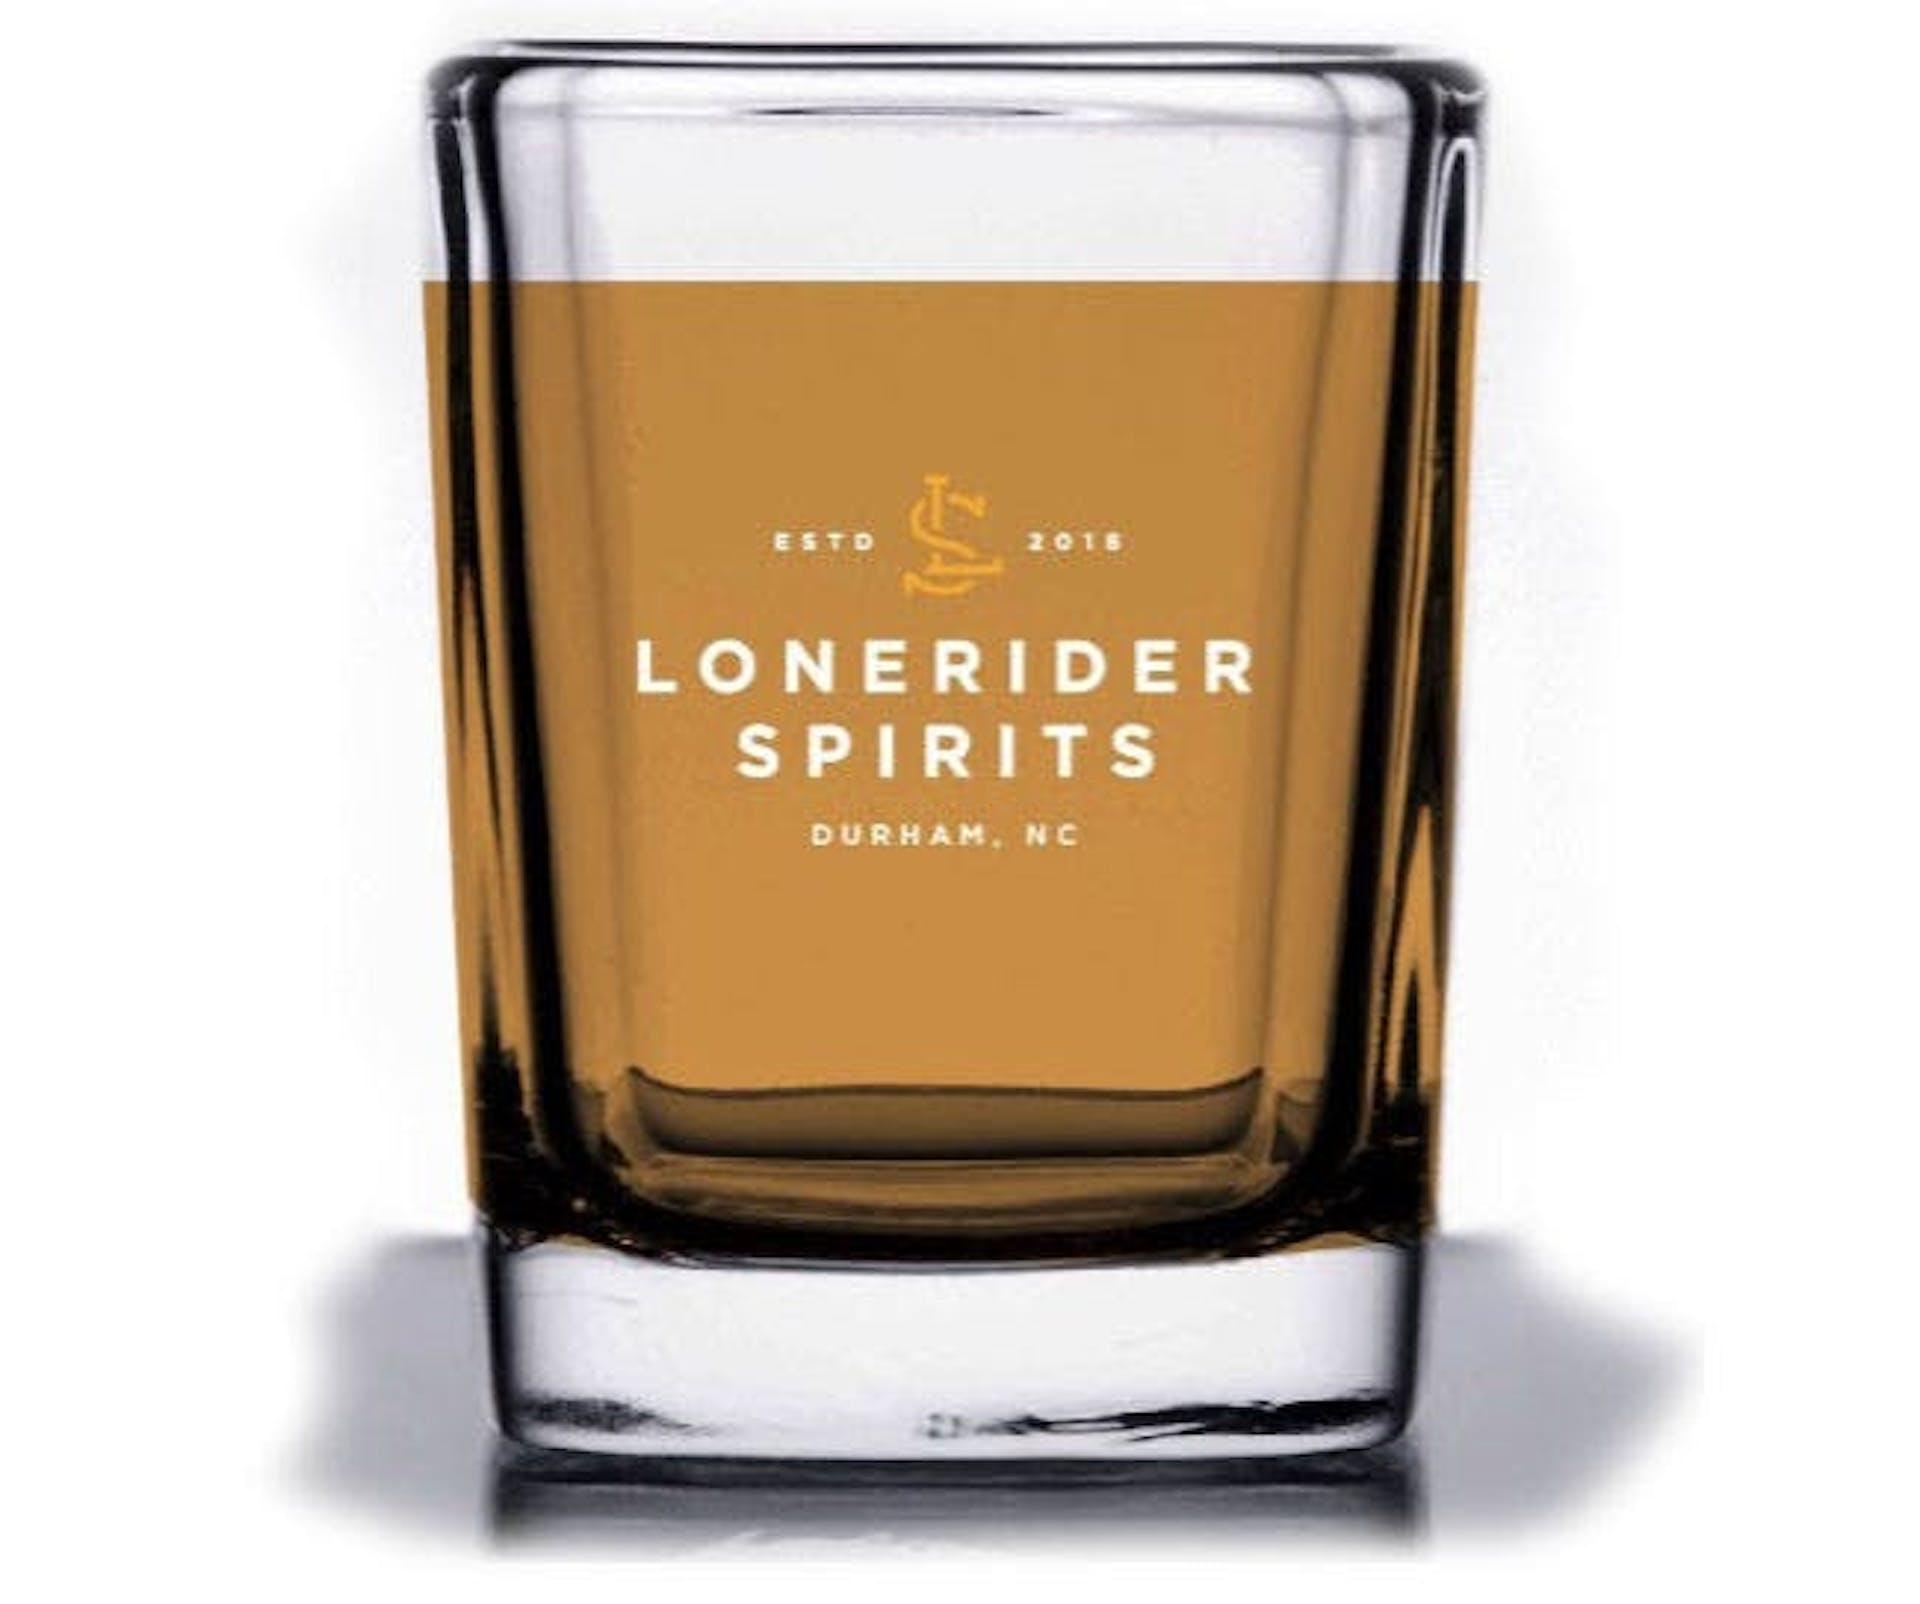 LR-Spirits-glass